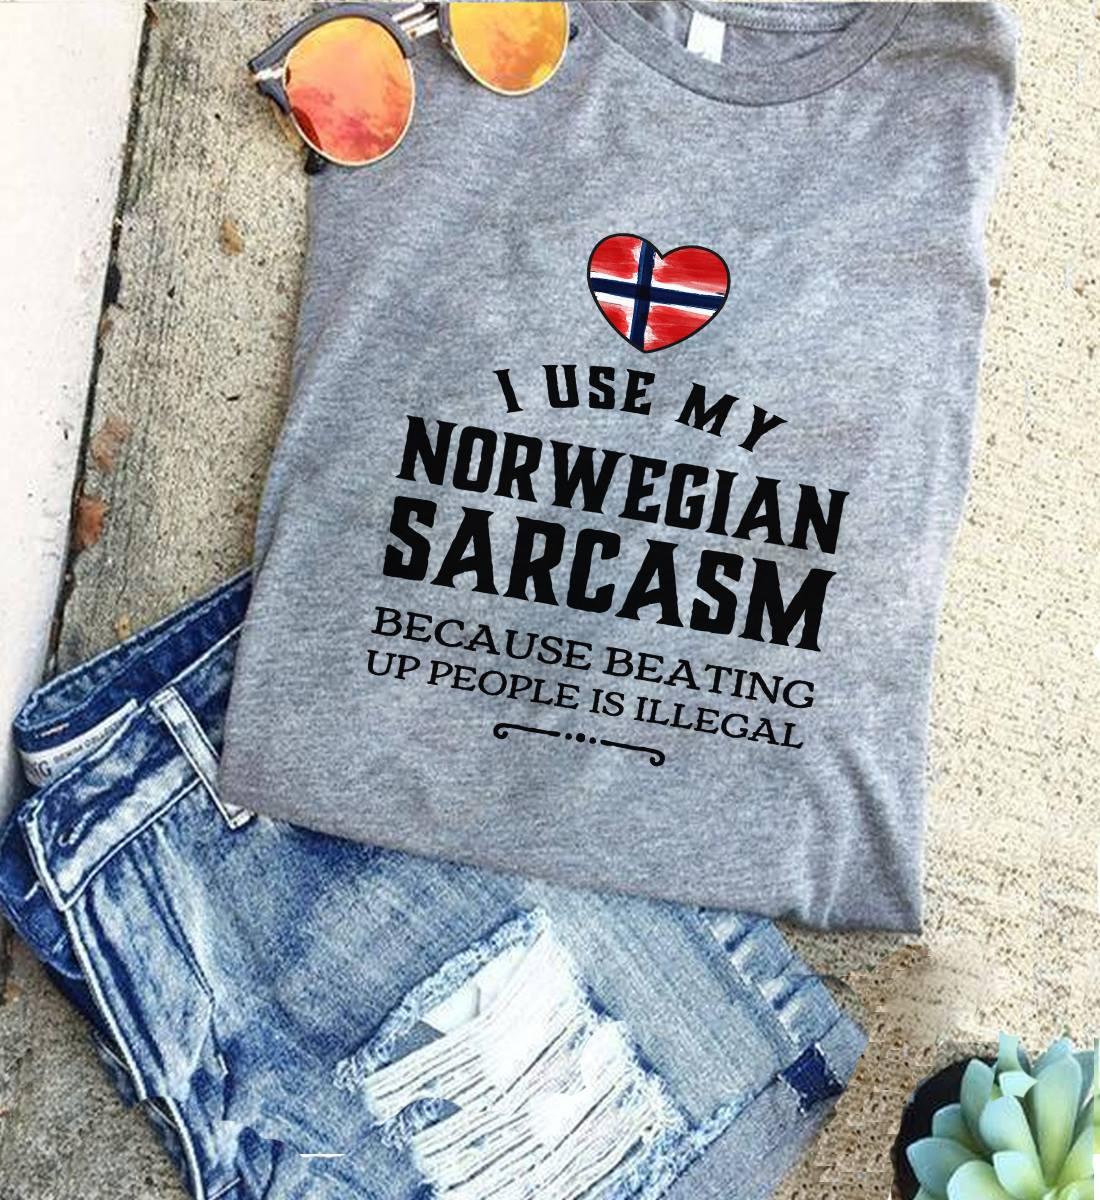 Norwegian Shirt I Use My Norwegian Sarcasm Beating Up People